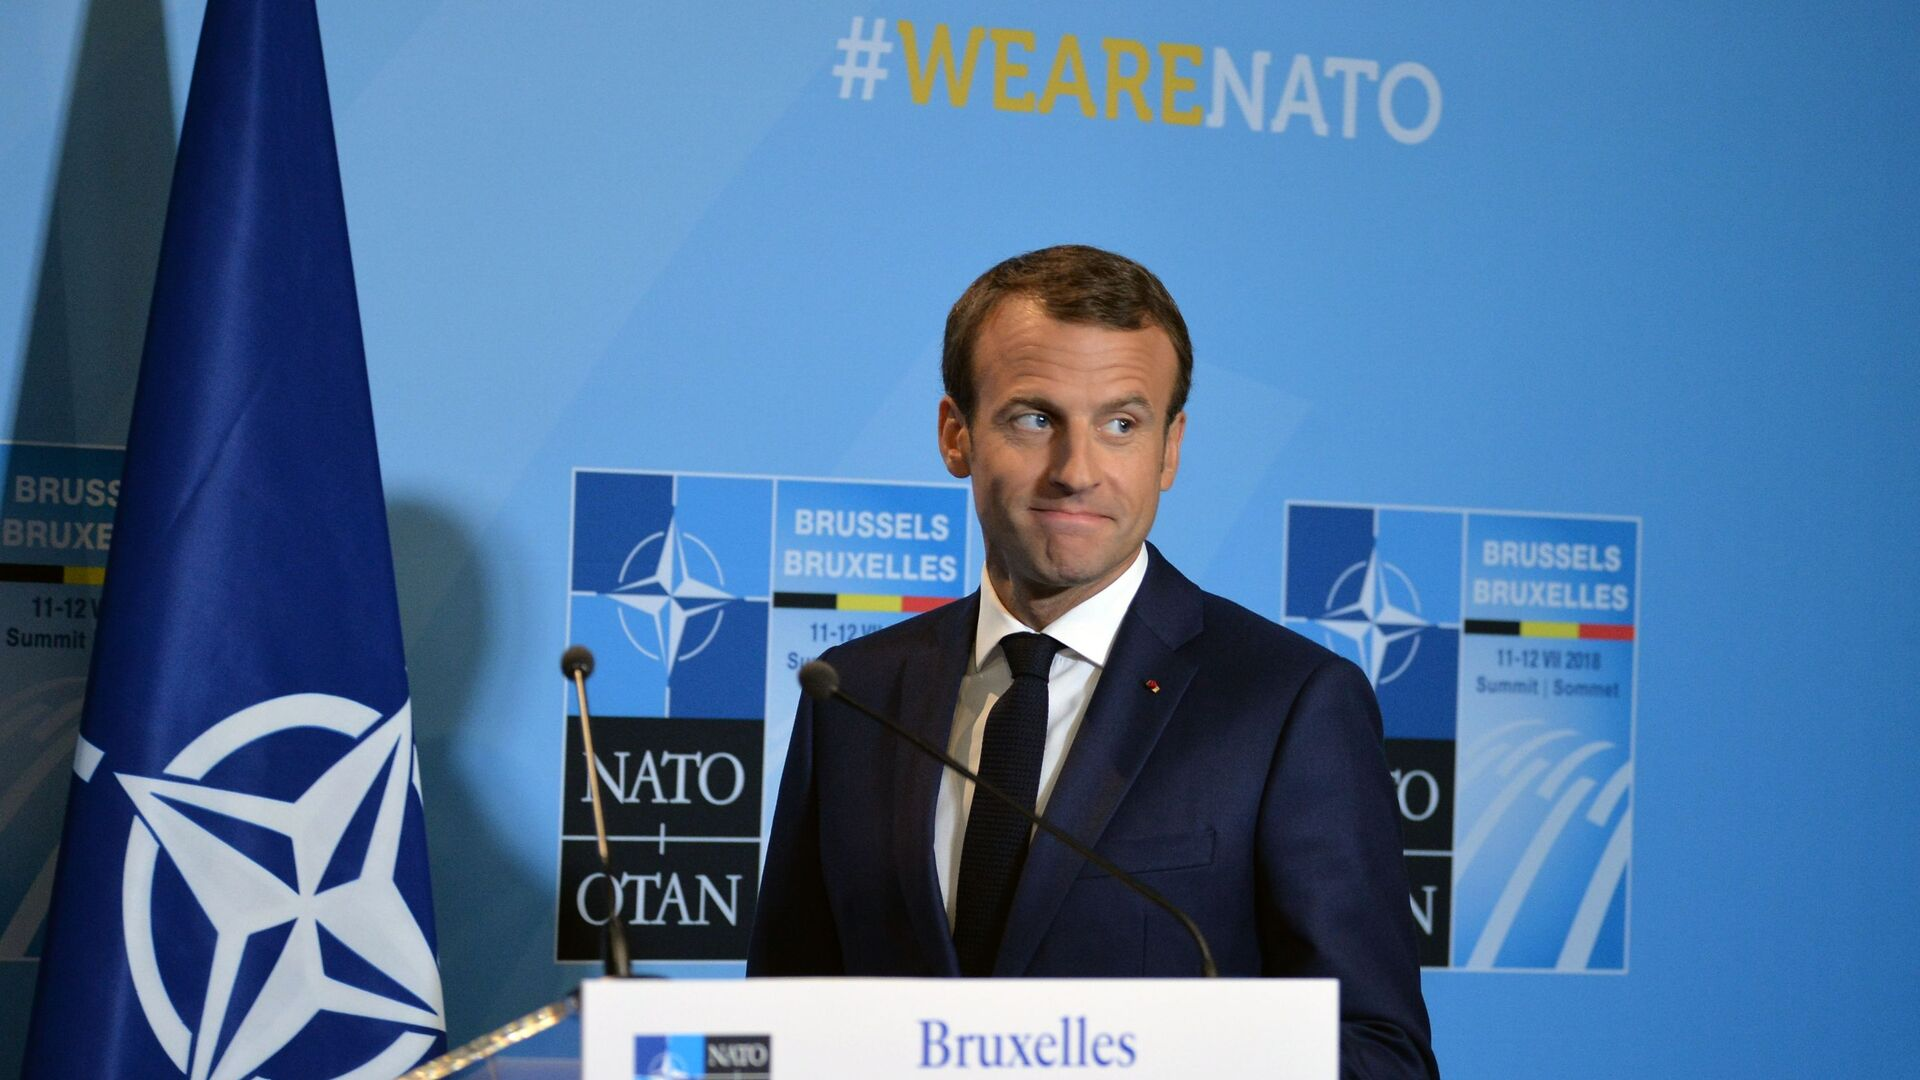 Emmanuel Macron lors d'un sommet de l'Otan  - Sputnik France, 1920, 16.03.2021